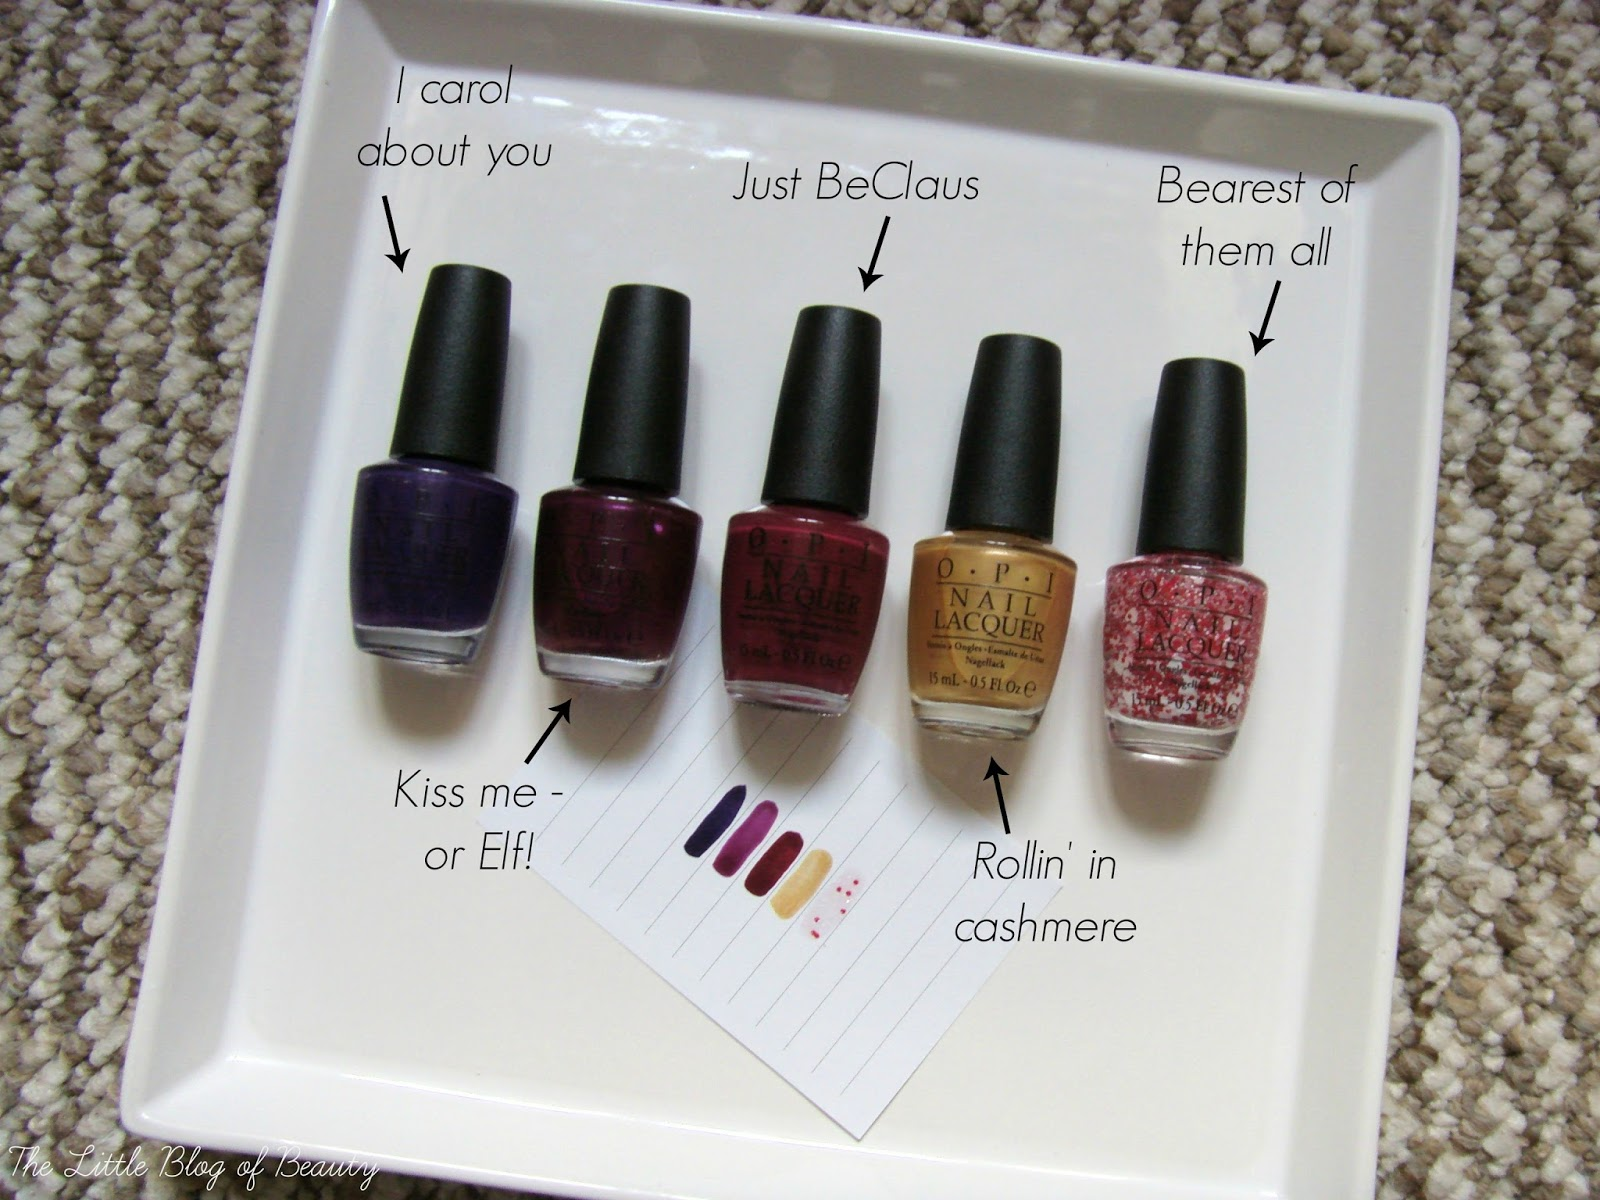 OPI nail varnishes - Gwen Stefani & Coca Cola